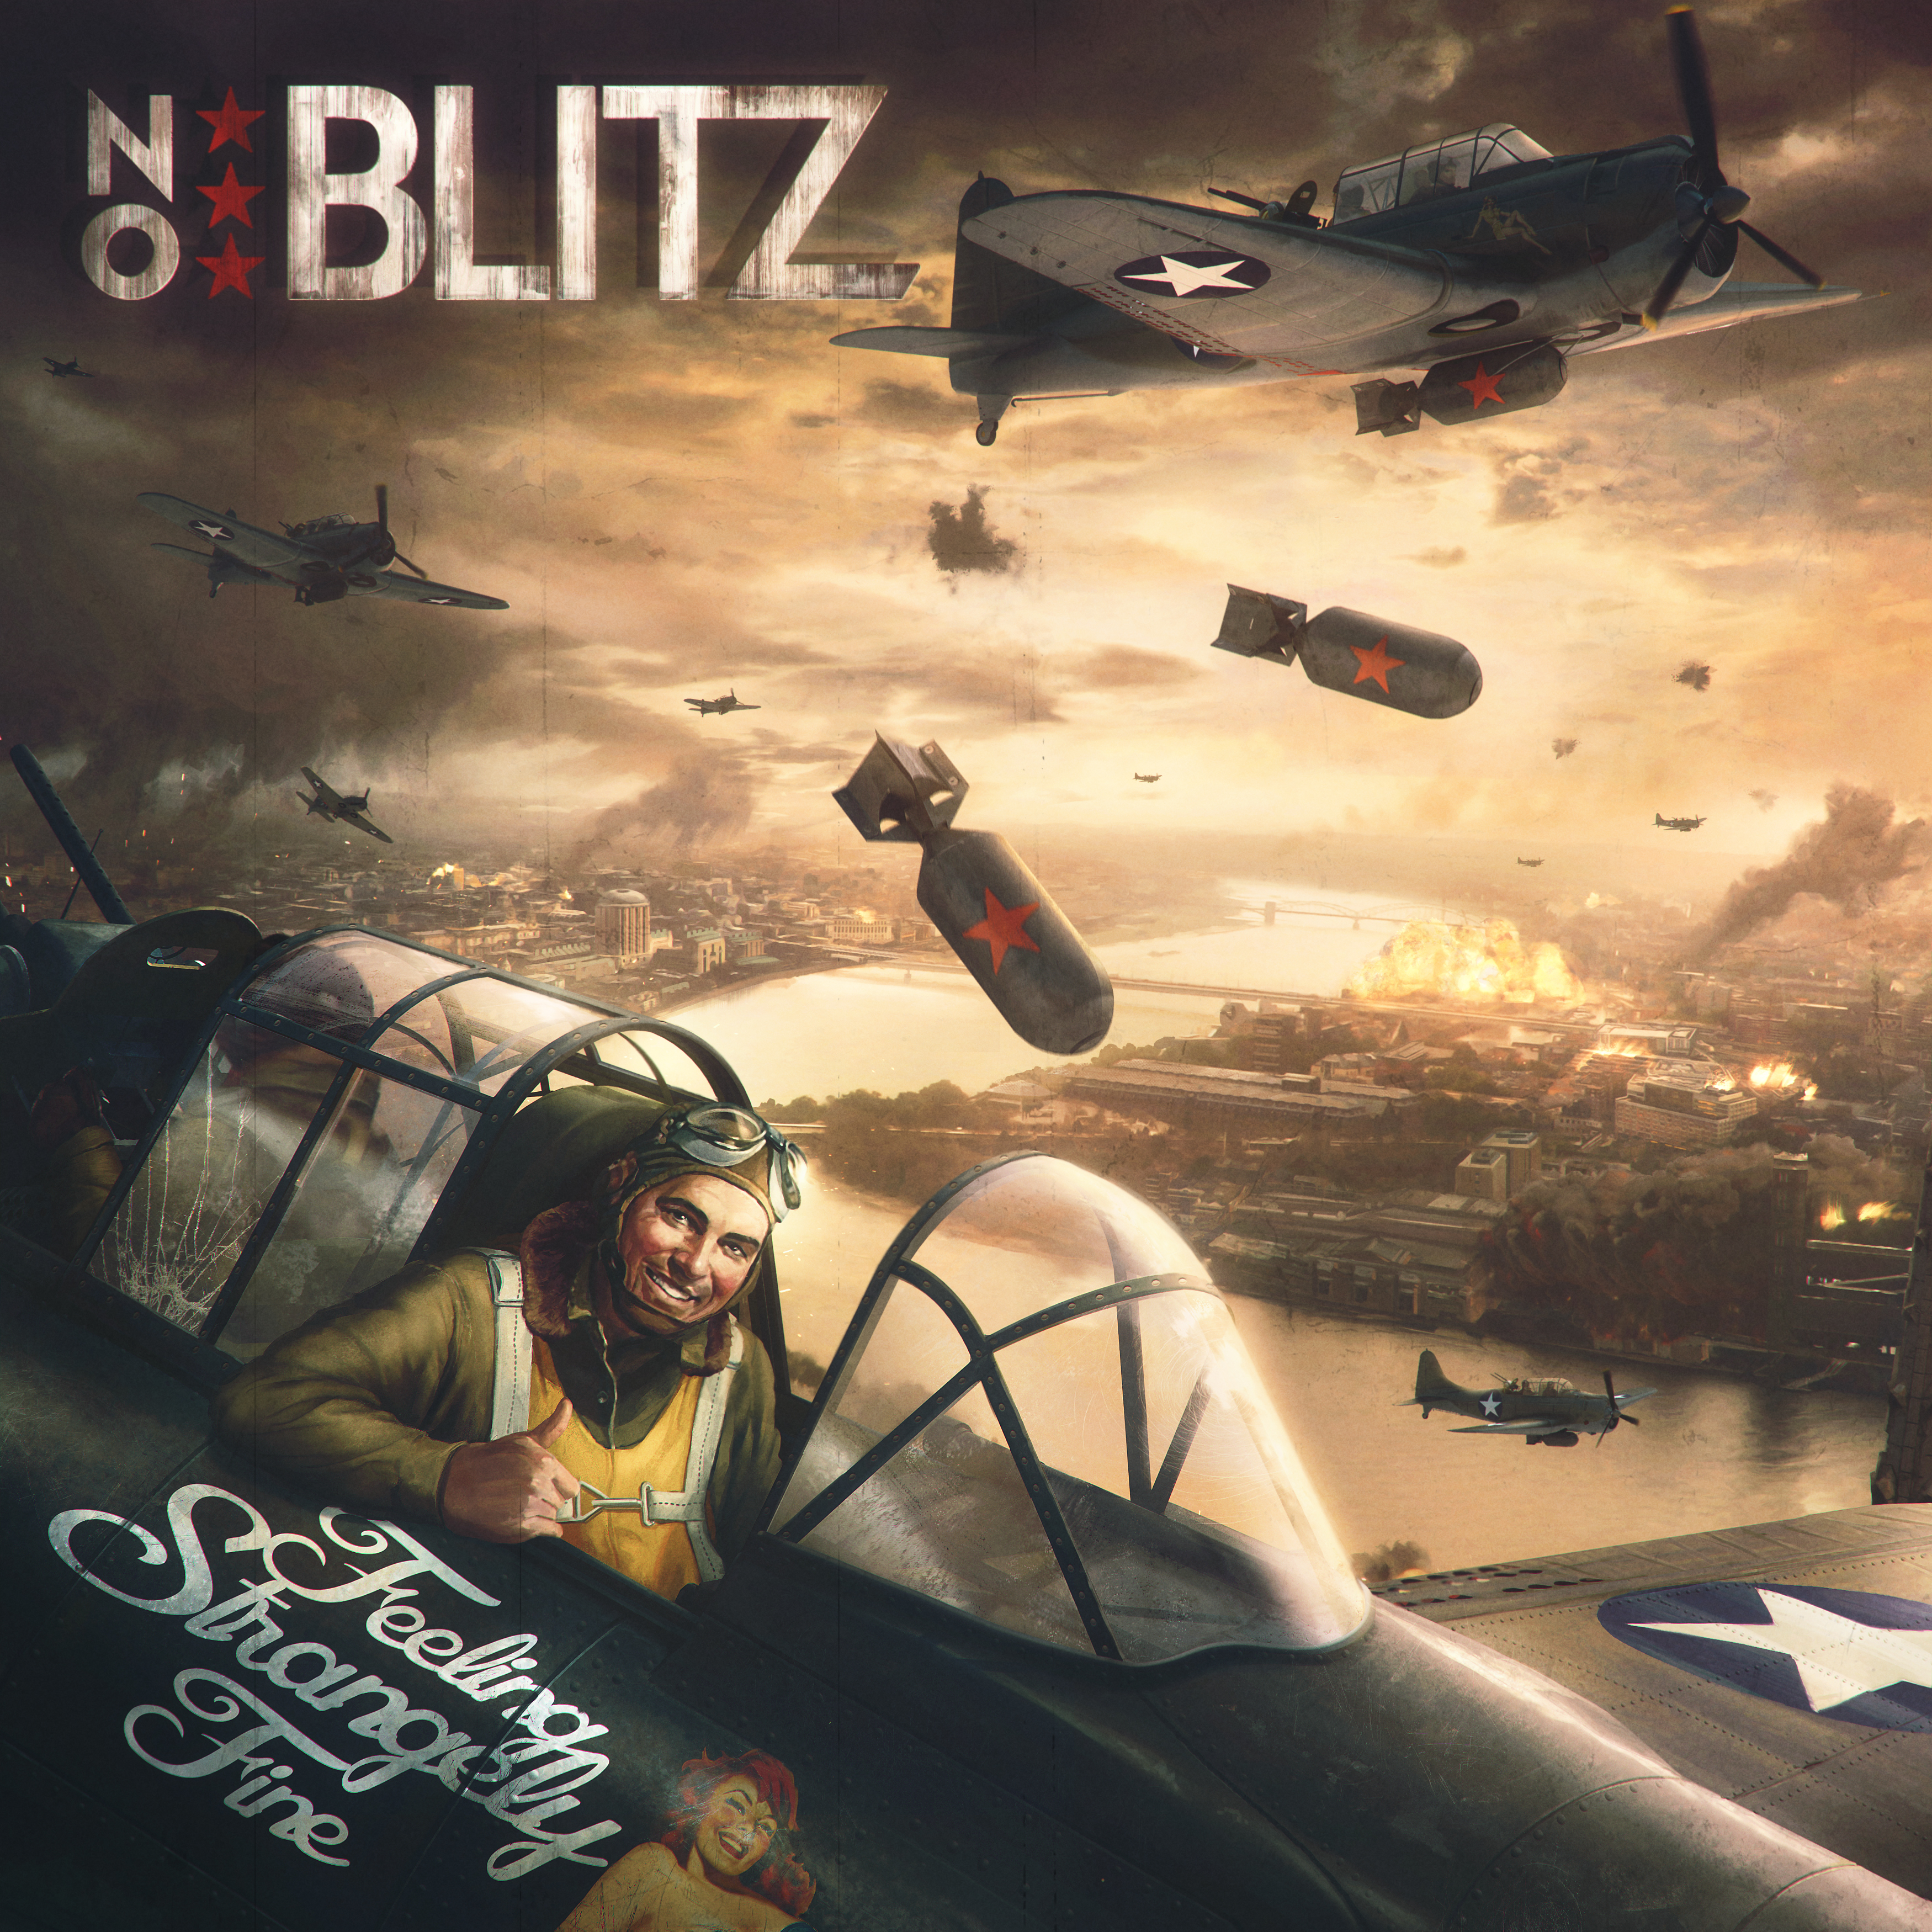 No_Blitz_Album_TITLE